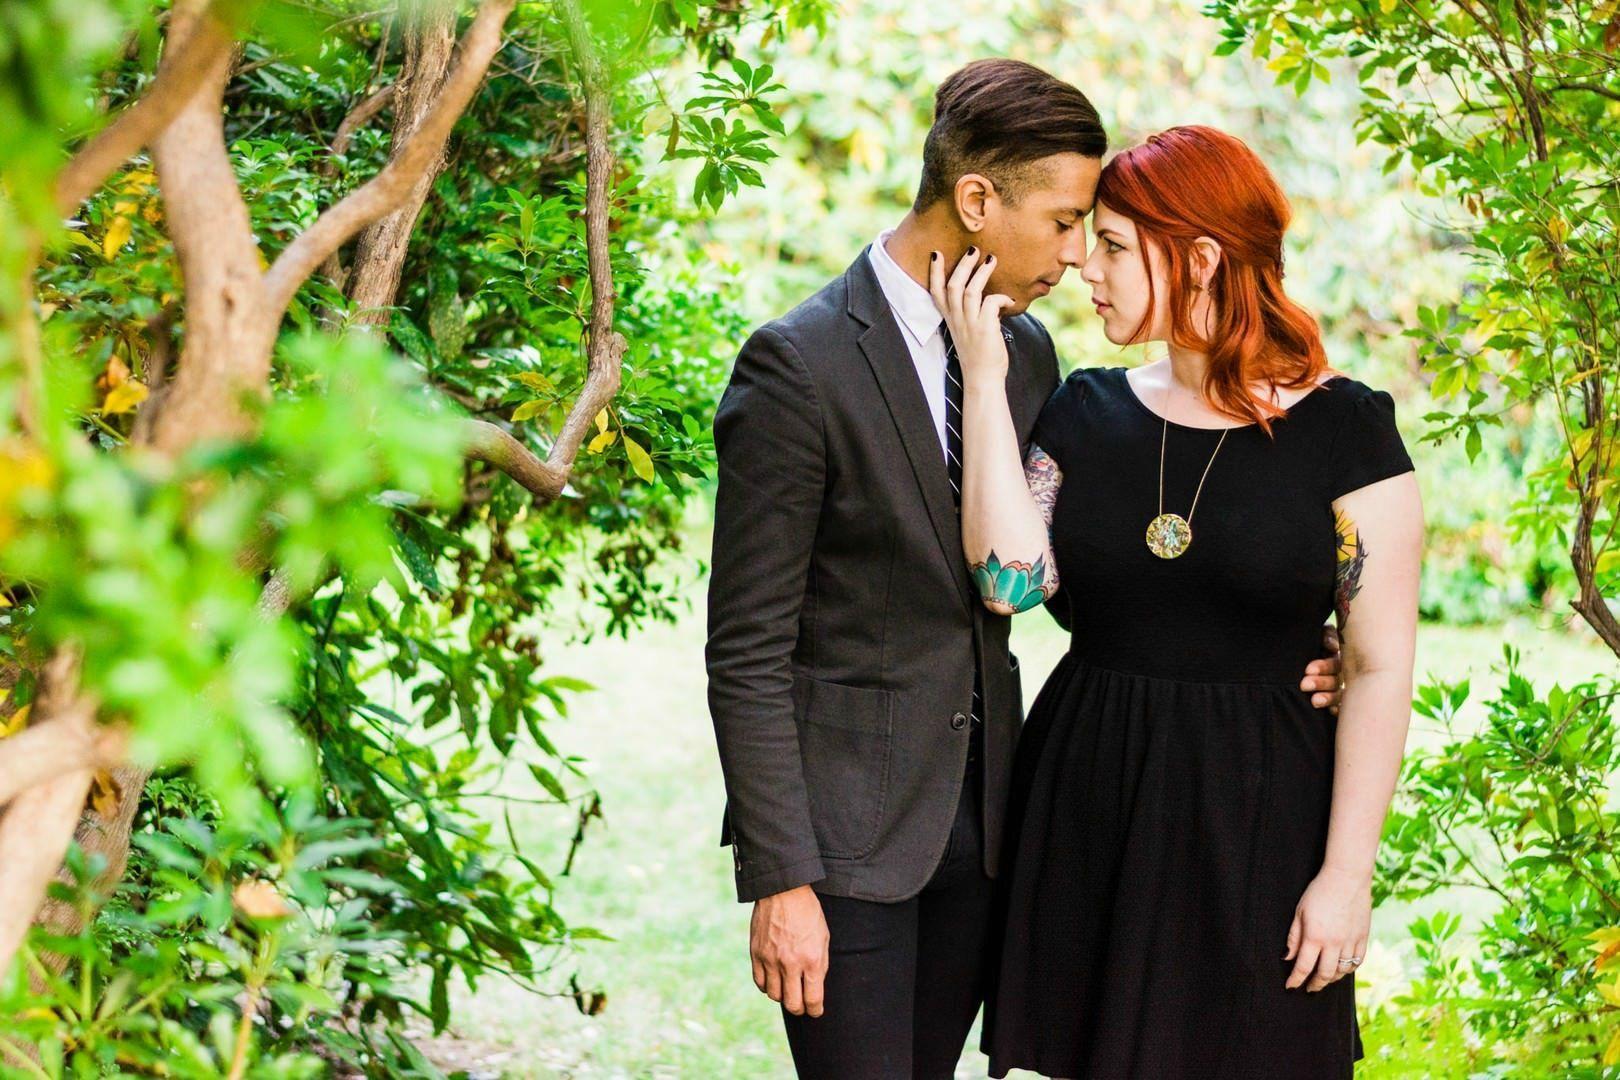 tattoo-redhead-interracial-couple-in-garden-nj-wedding-photographer-van-vleck-house-montclair-1-couple